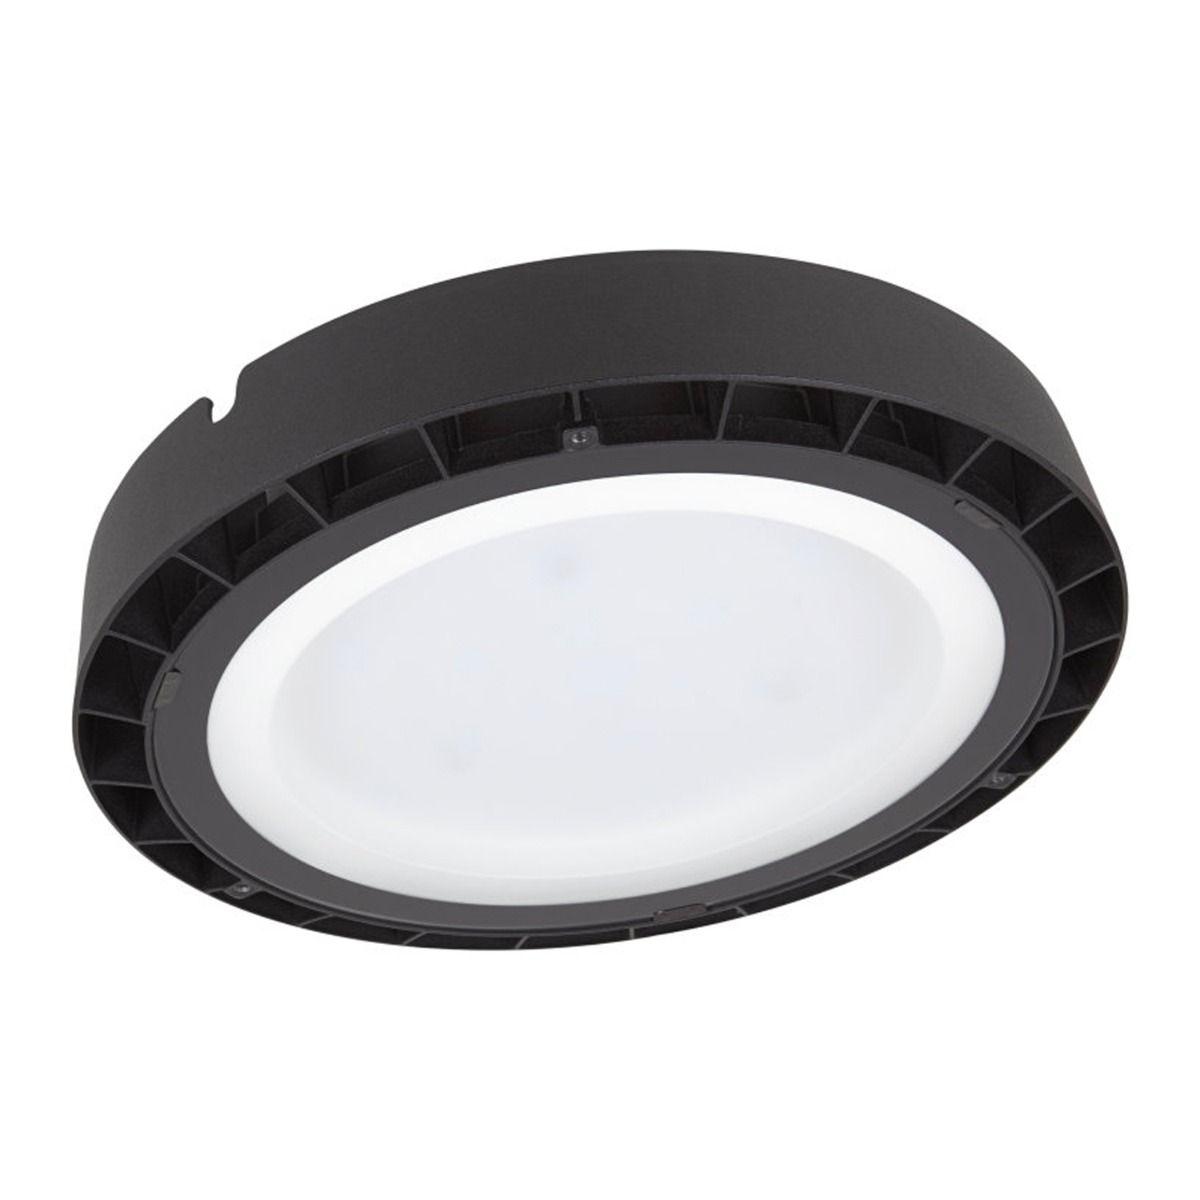 Ledvance LED High Bay Value 100W 4000K IP65 10000lm 100D   Kaltweiß - Ersatz für 200W